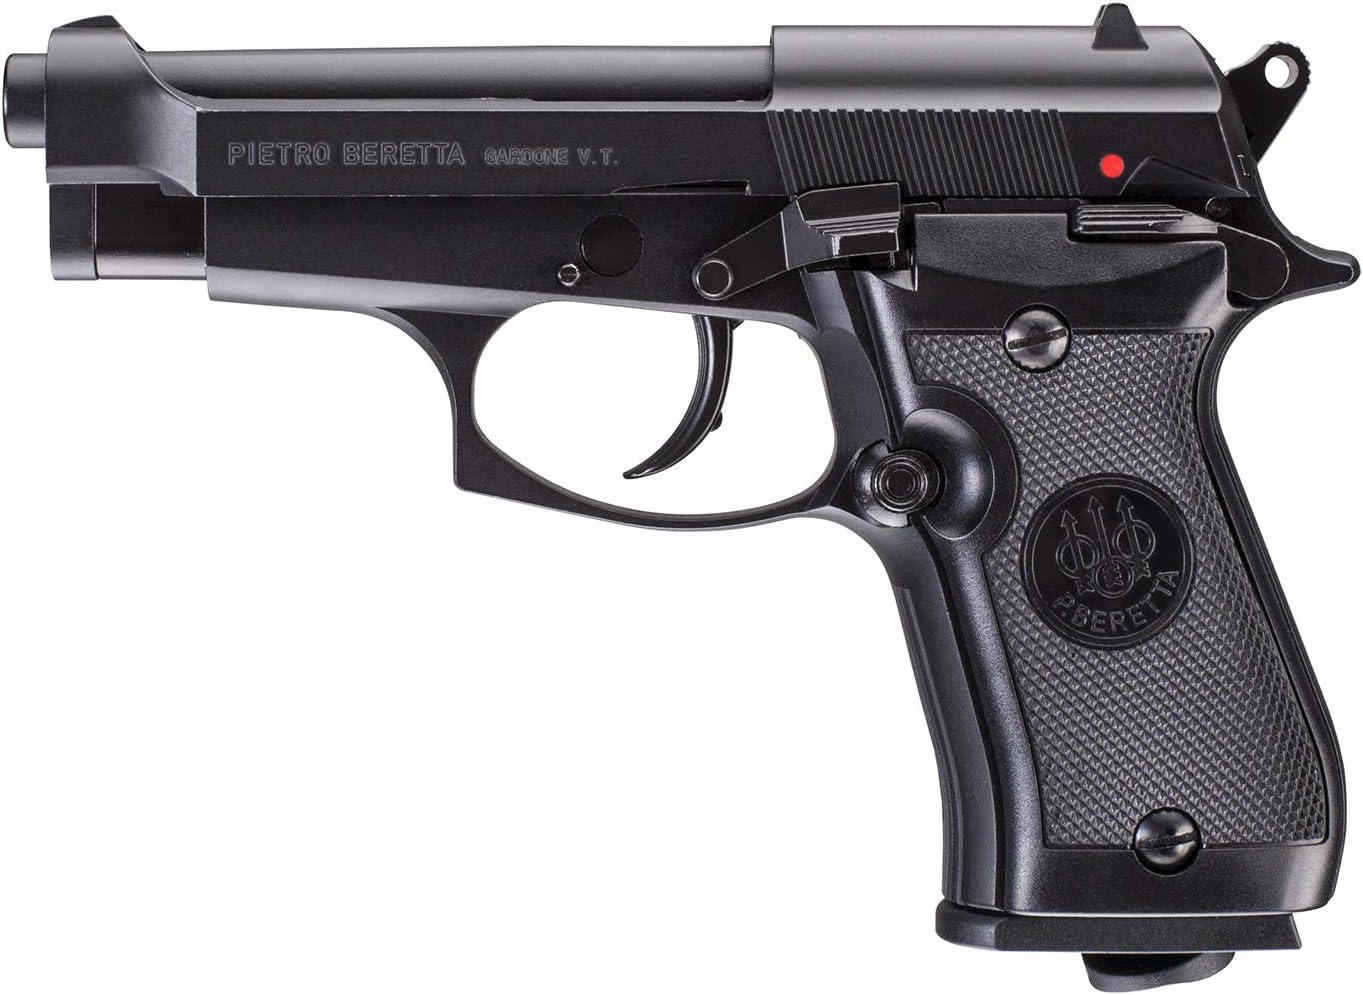 Beretta MOD. 84FS Compact .177 Caliber BB Gun Air Pistol, Beretta MOD. 84FS Air Pistol : Everything Else